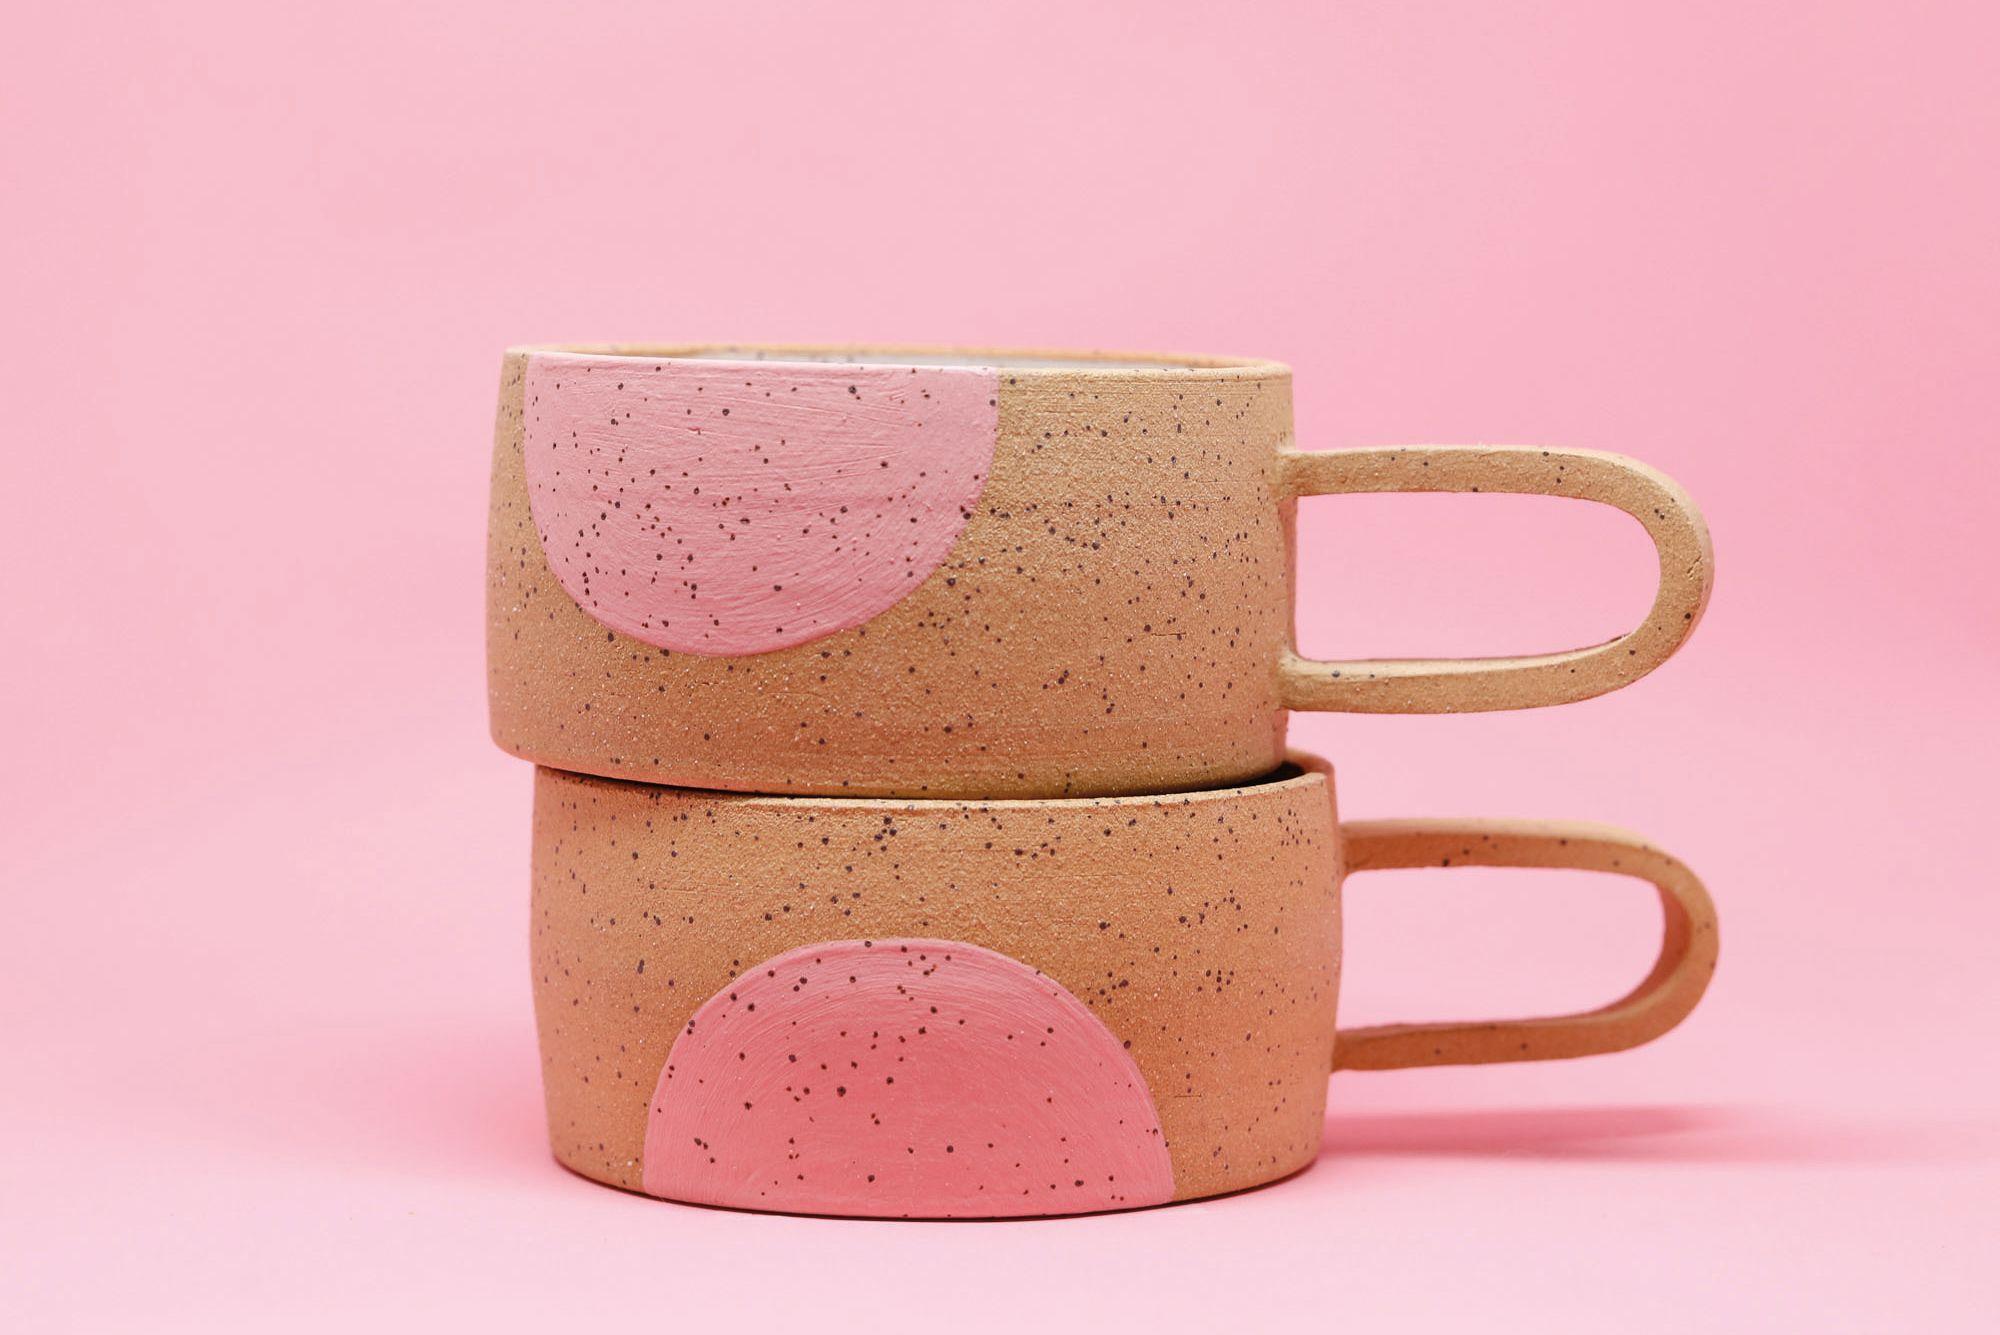 Pomo 1016 trophy case mimi ceramics tvhubi